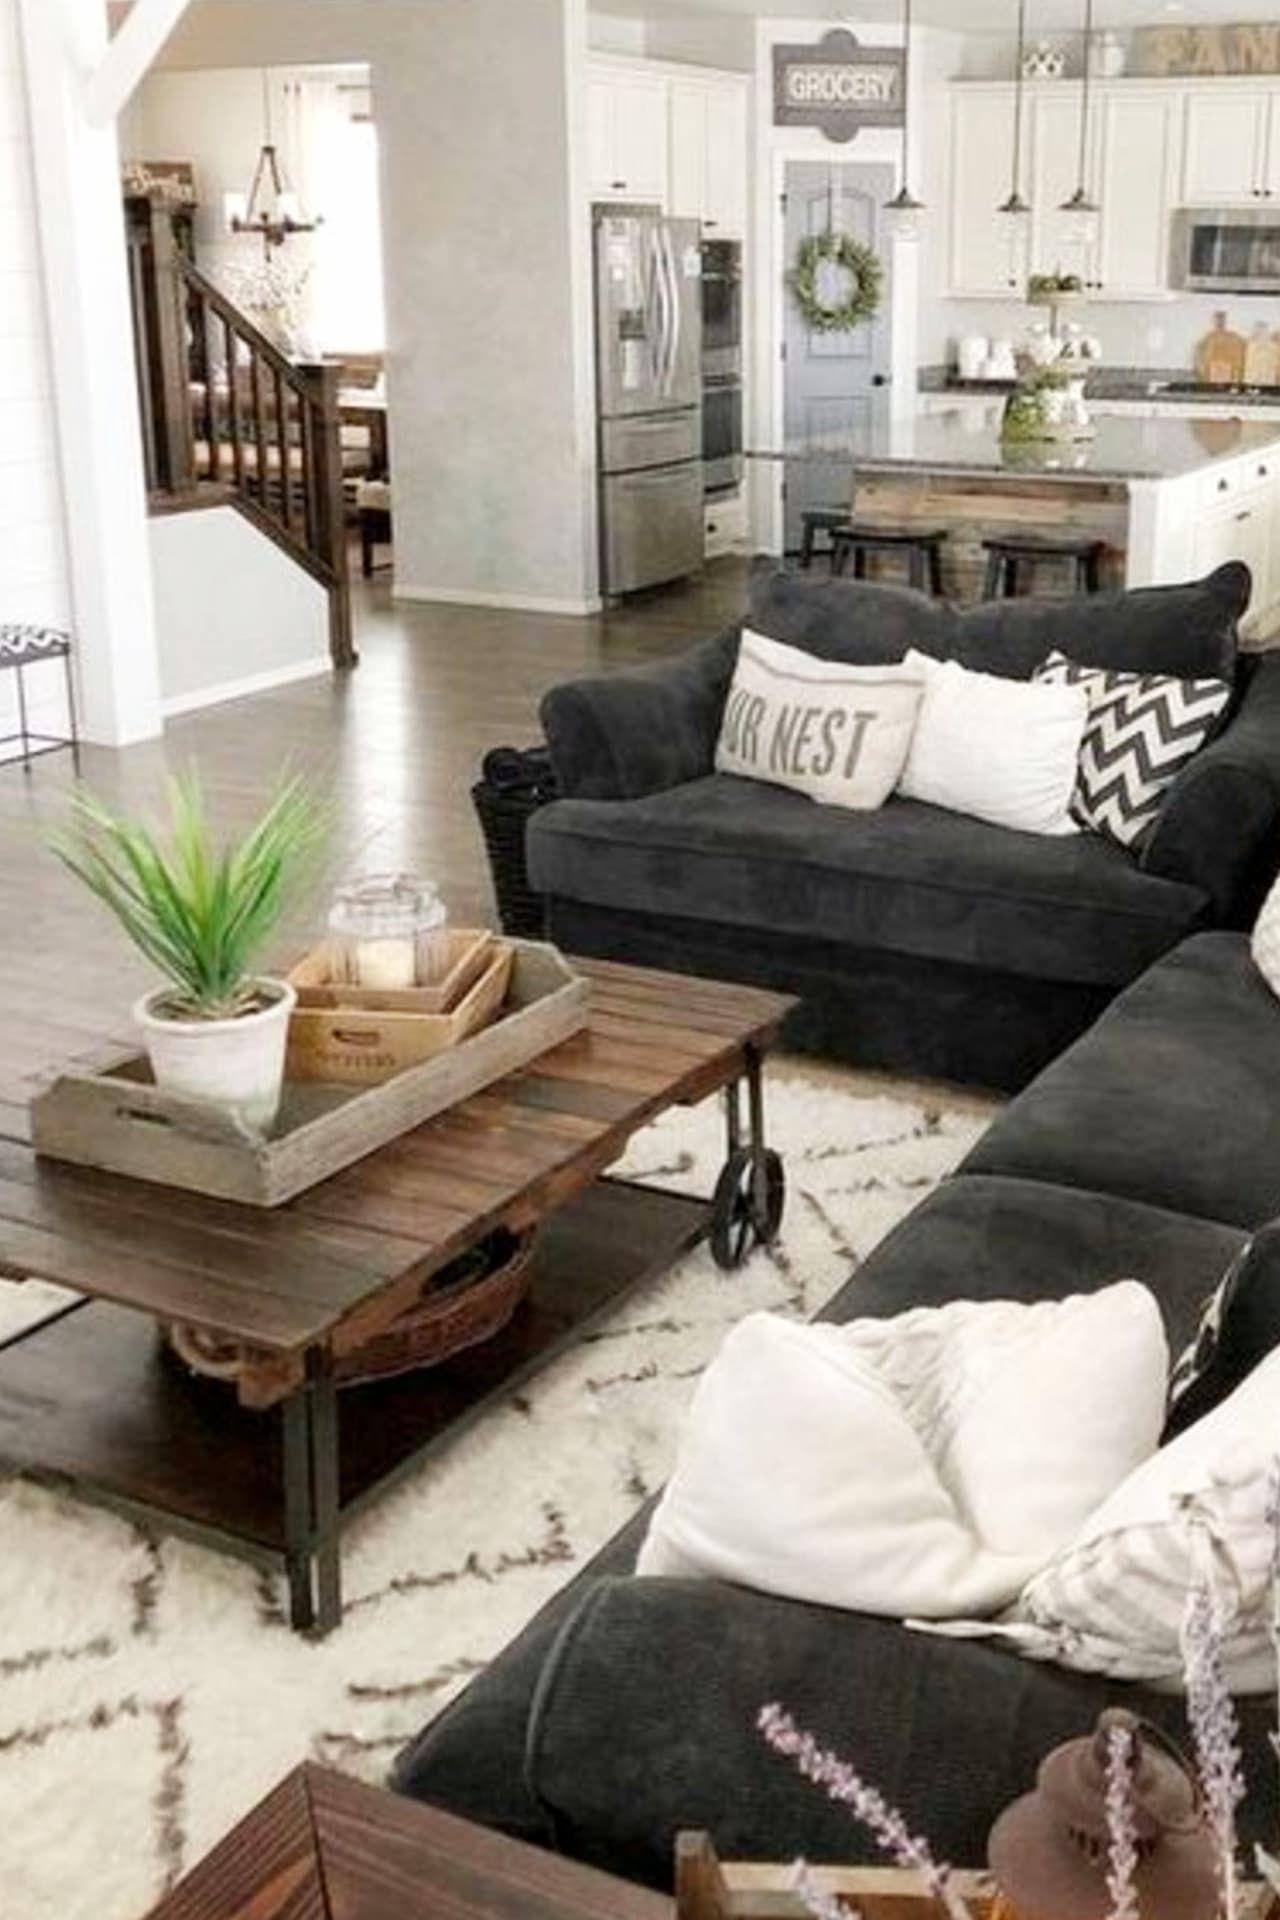 Cozy Neutral Living Room Ideas Earthy Gray Living Rooms To Copy Farm House Living Room Neutral Living Room Room Makeover